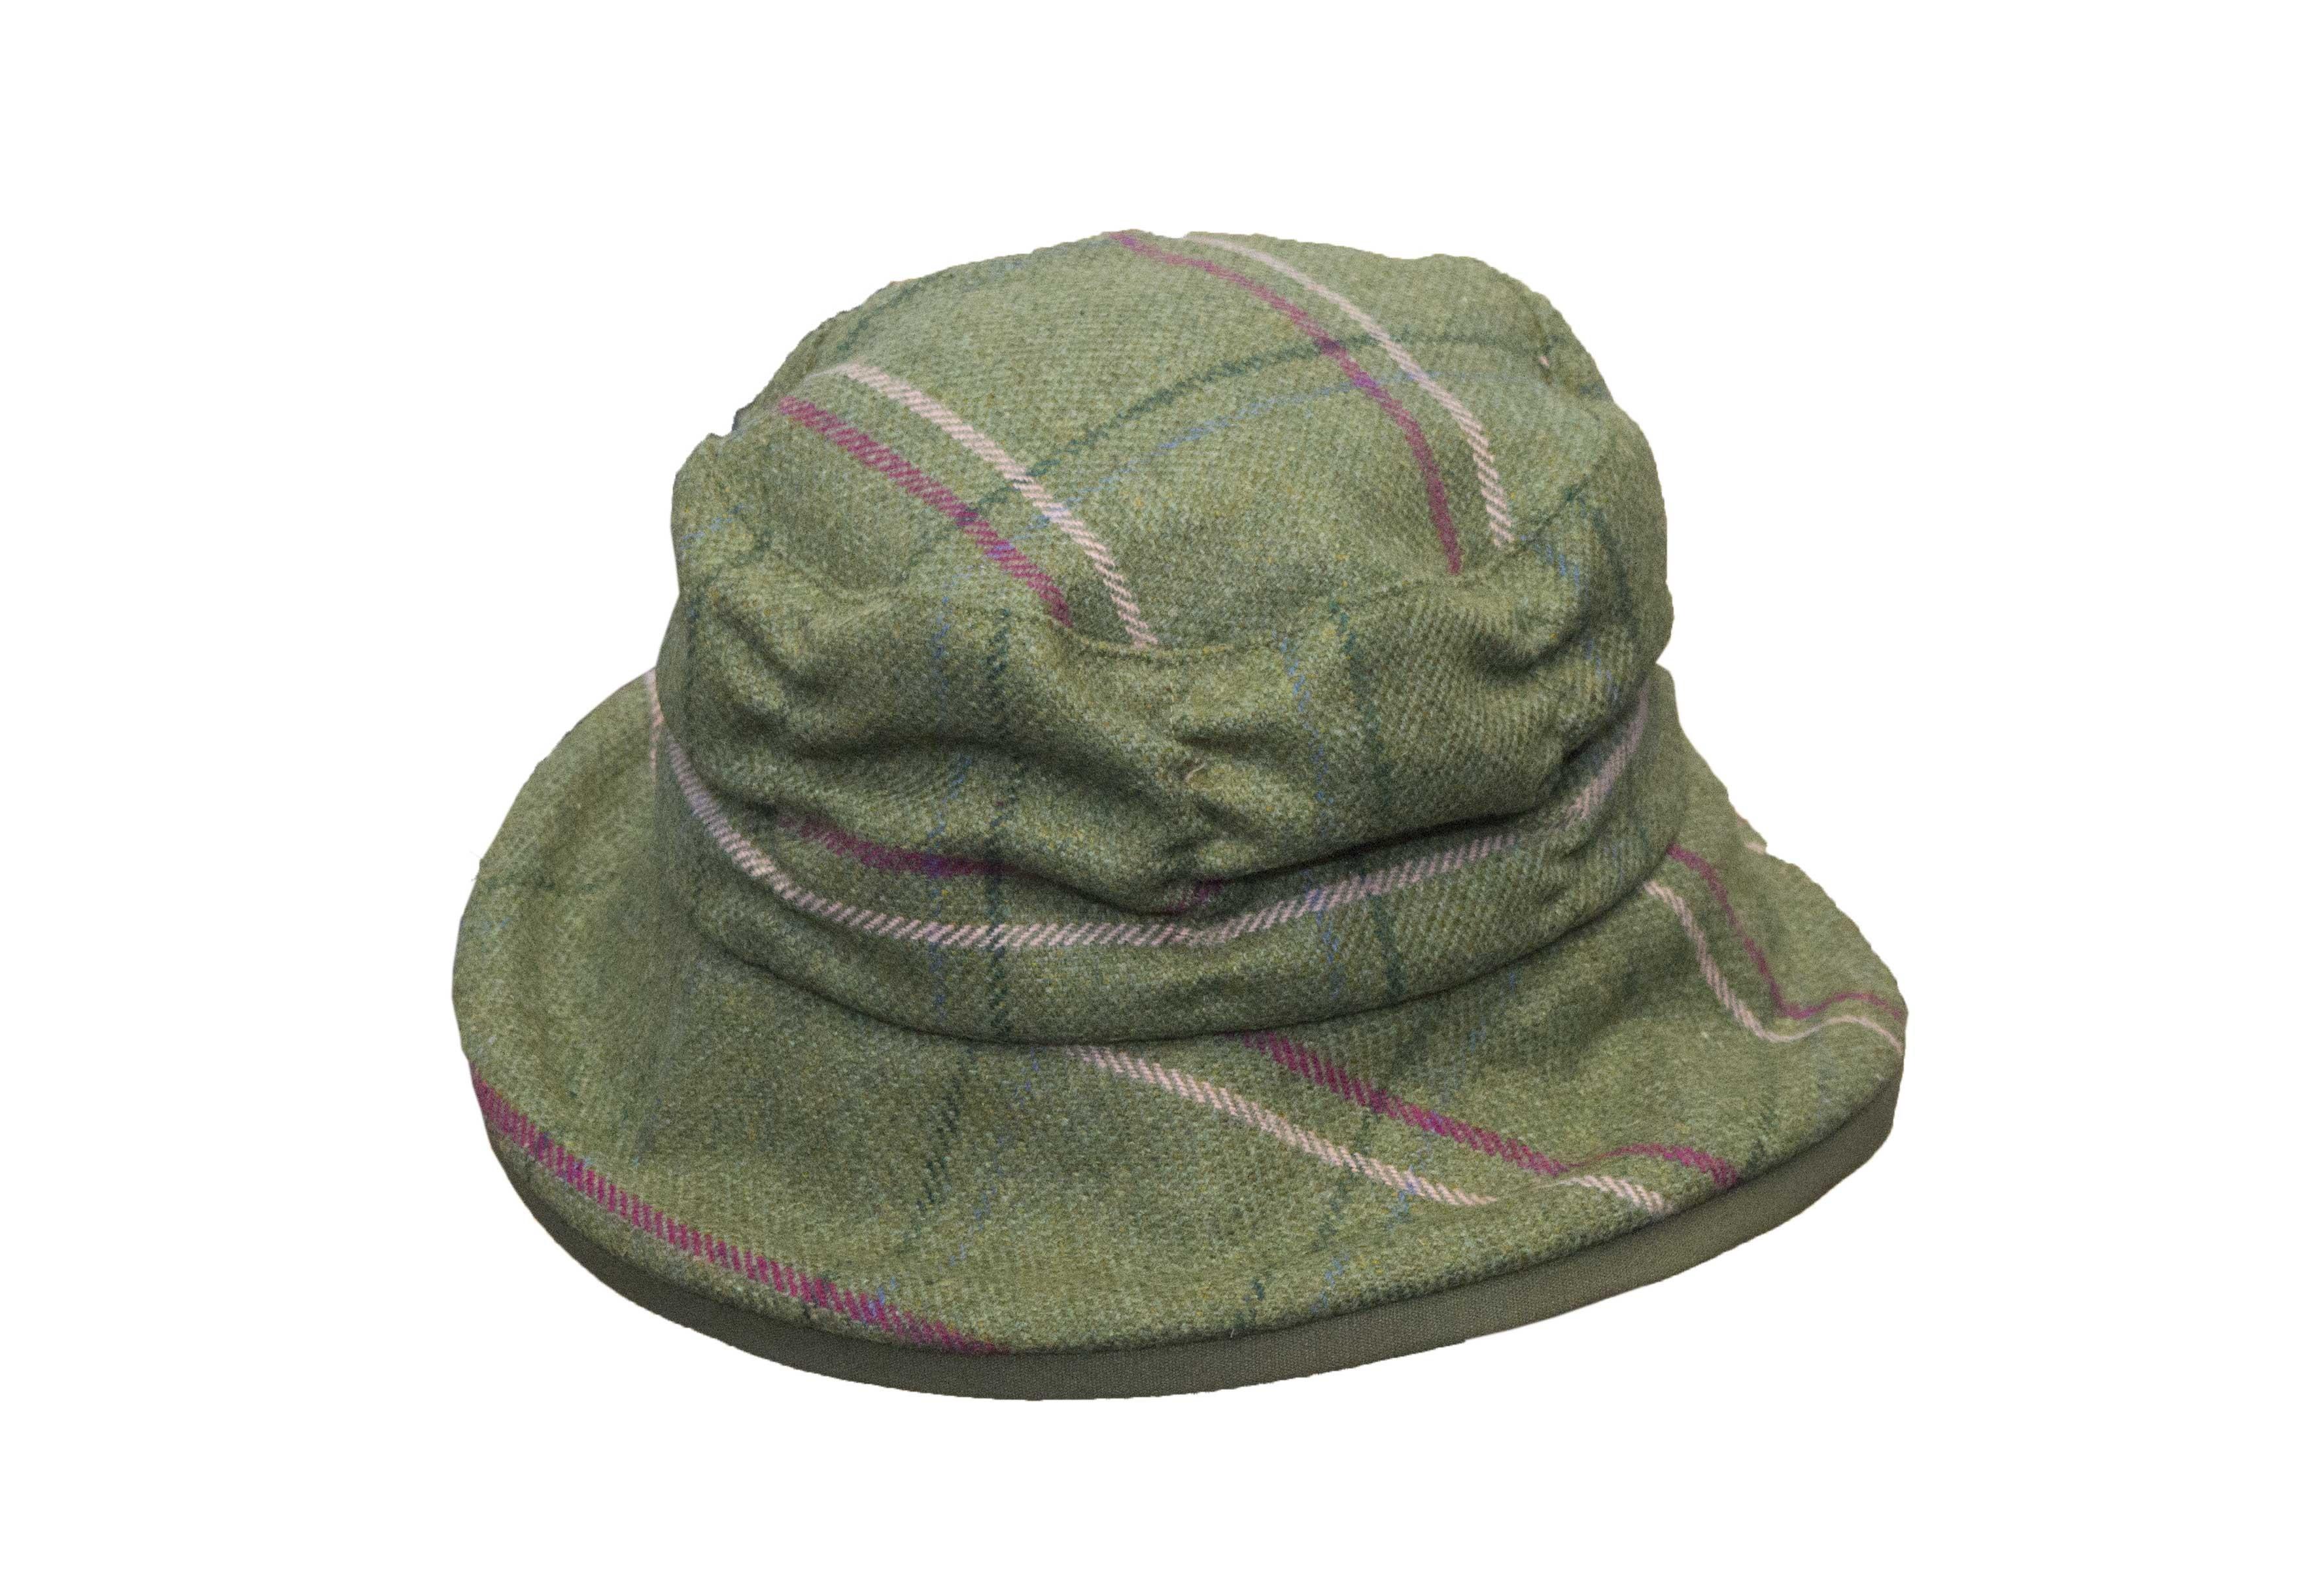 Chapeau en tweed femme vert et rose